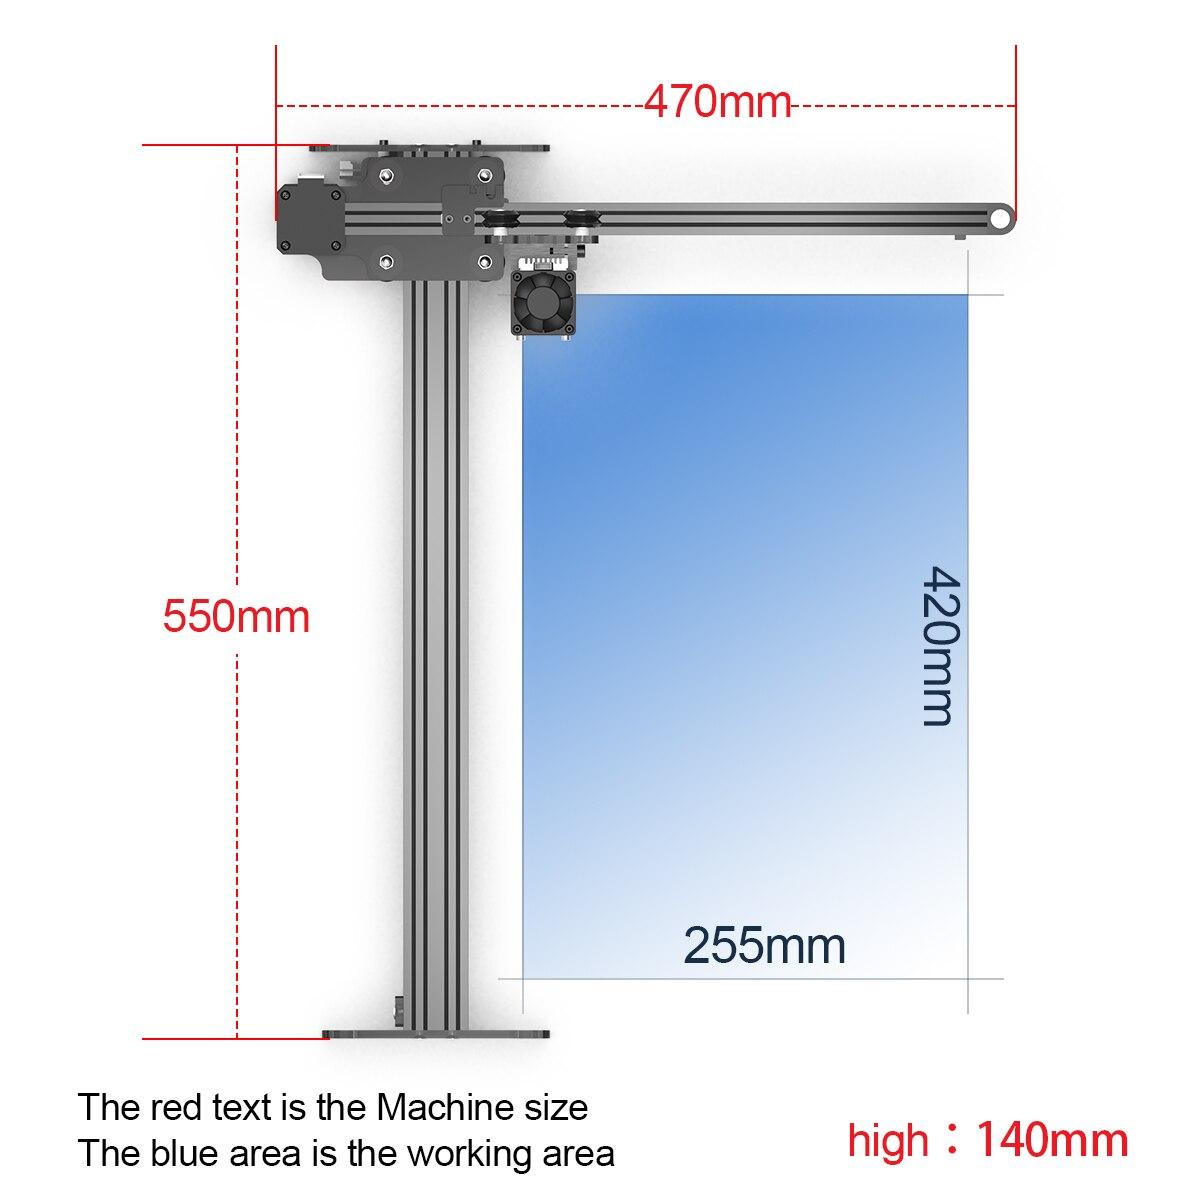 NEJE Master 2S Plus 80W CNC Laser Engraving Cutting Machine Wood Engraver Cutter Metal Mark Tool Bluetooth-App Control Lightburn enlarge